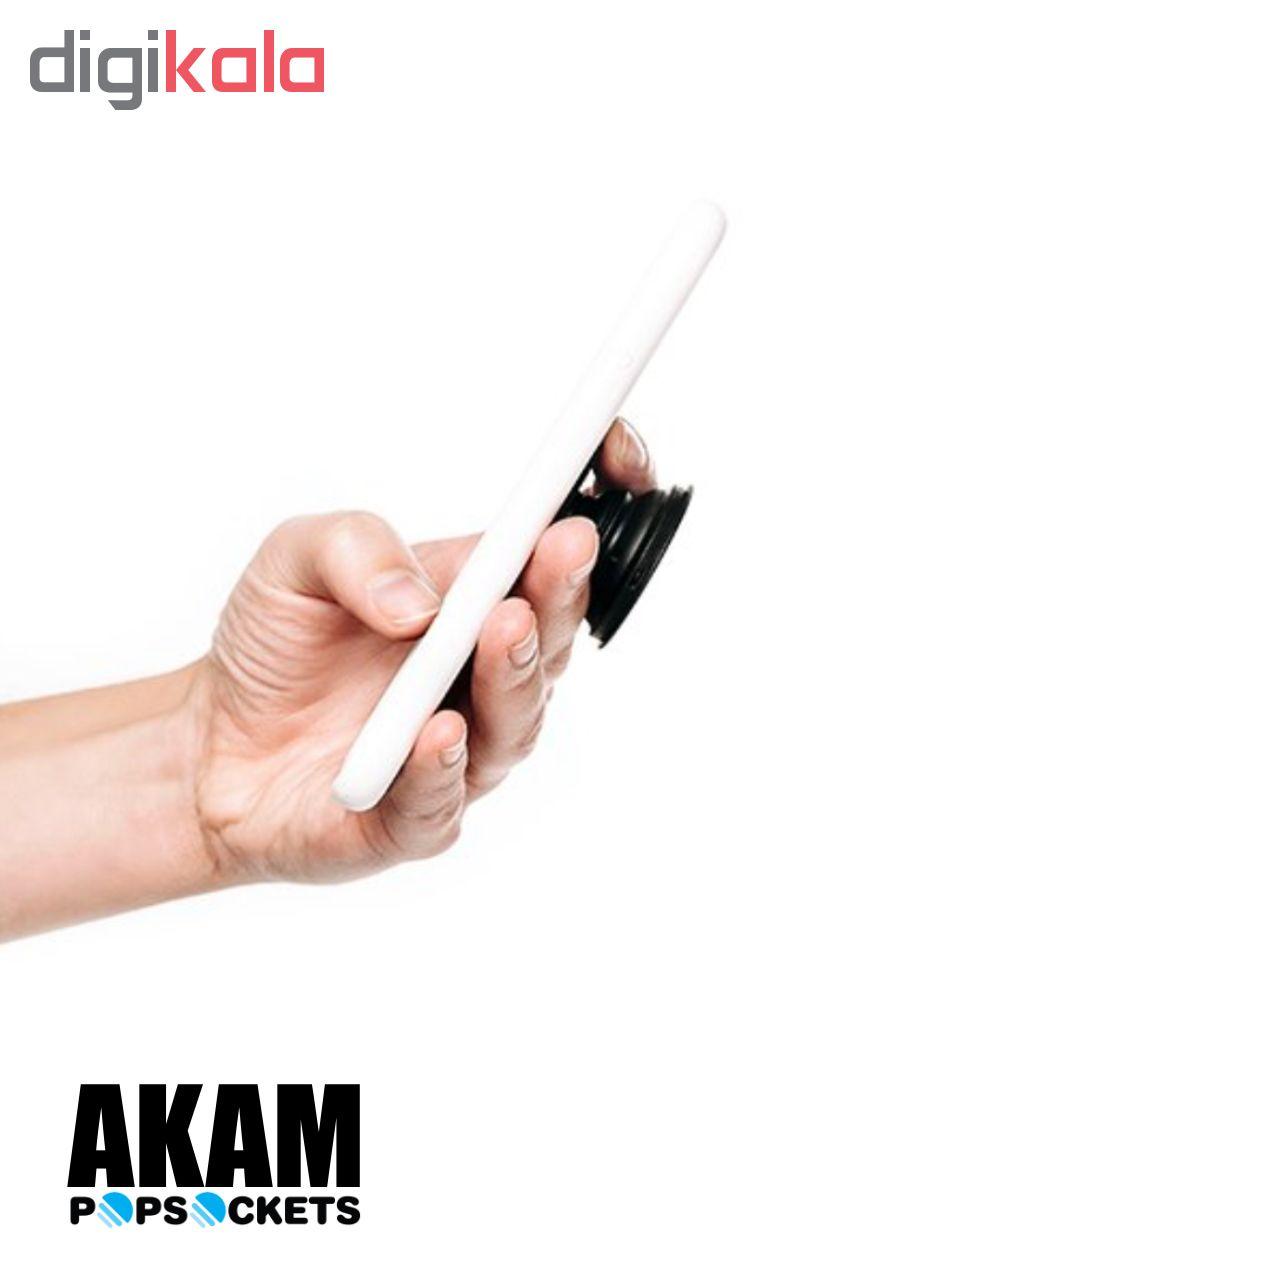 پایه نگهدارنده گوشی موبایل پاپ سوکت آکام مدل APS0168 main 1 8